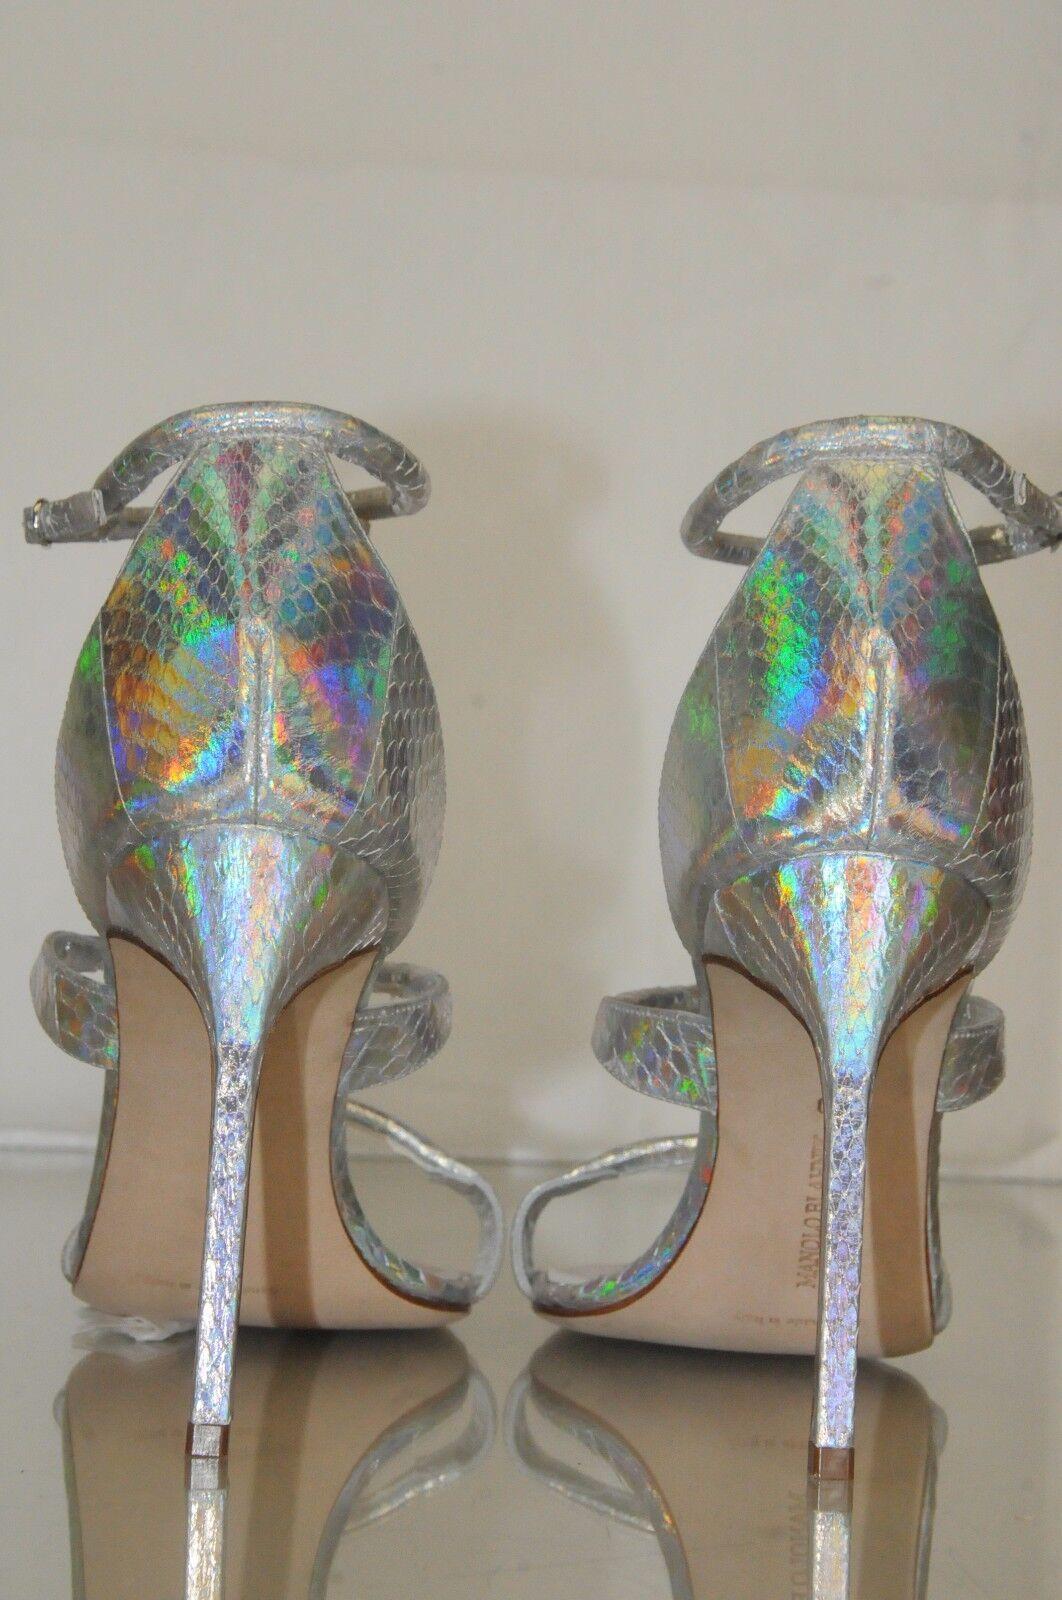 $995 New Blahnik Manolo Blahnik New Bombita SNAKE Silver Strappy Sandals BB schuhes 40 WEDDING a409da